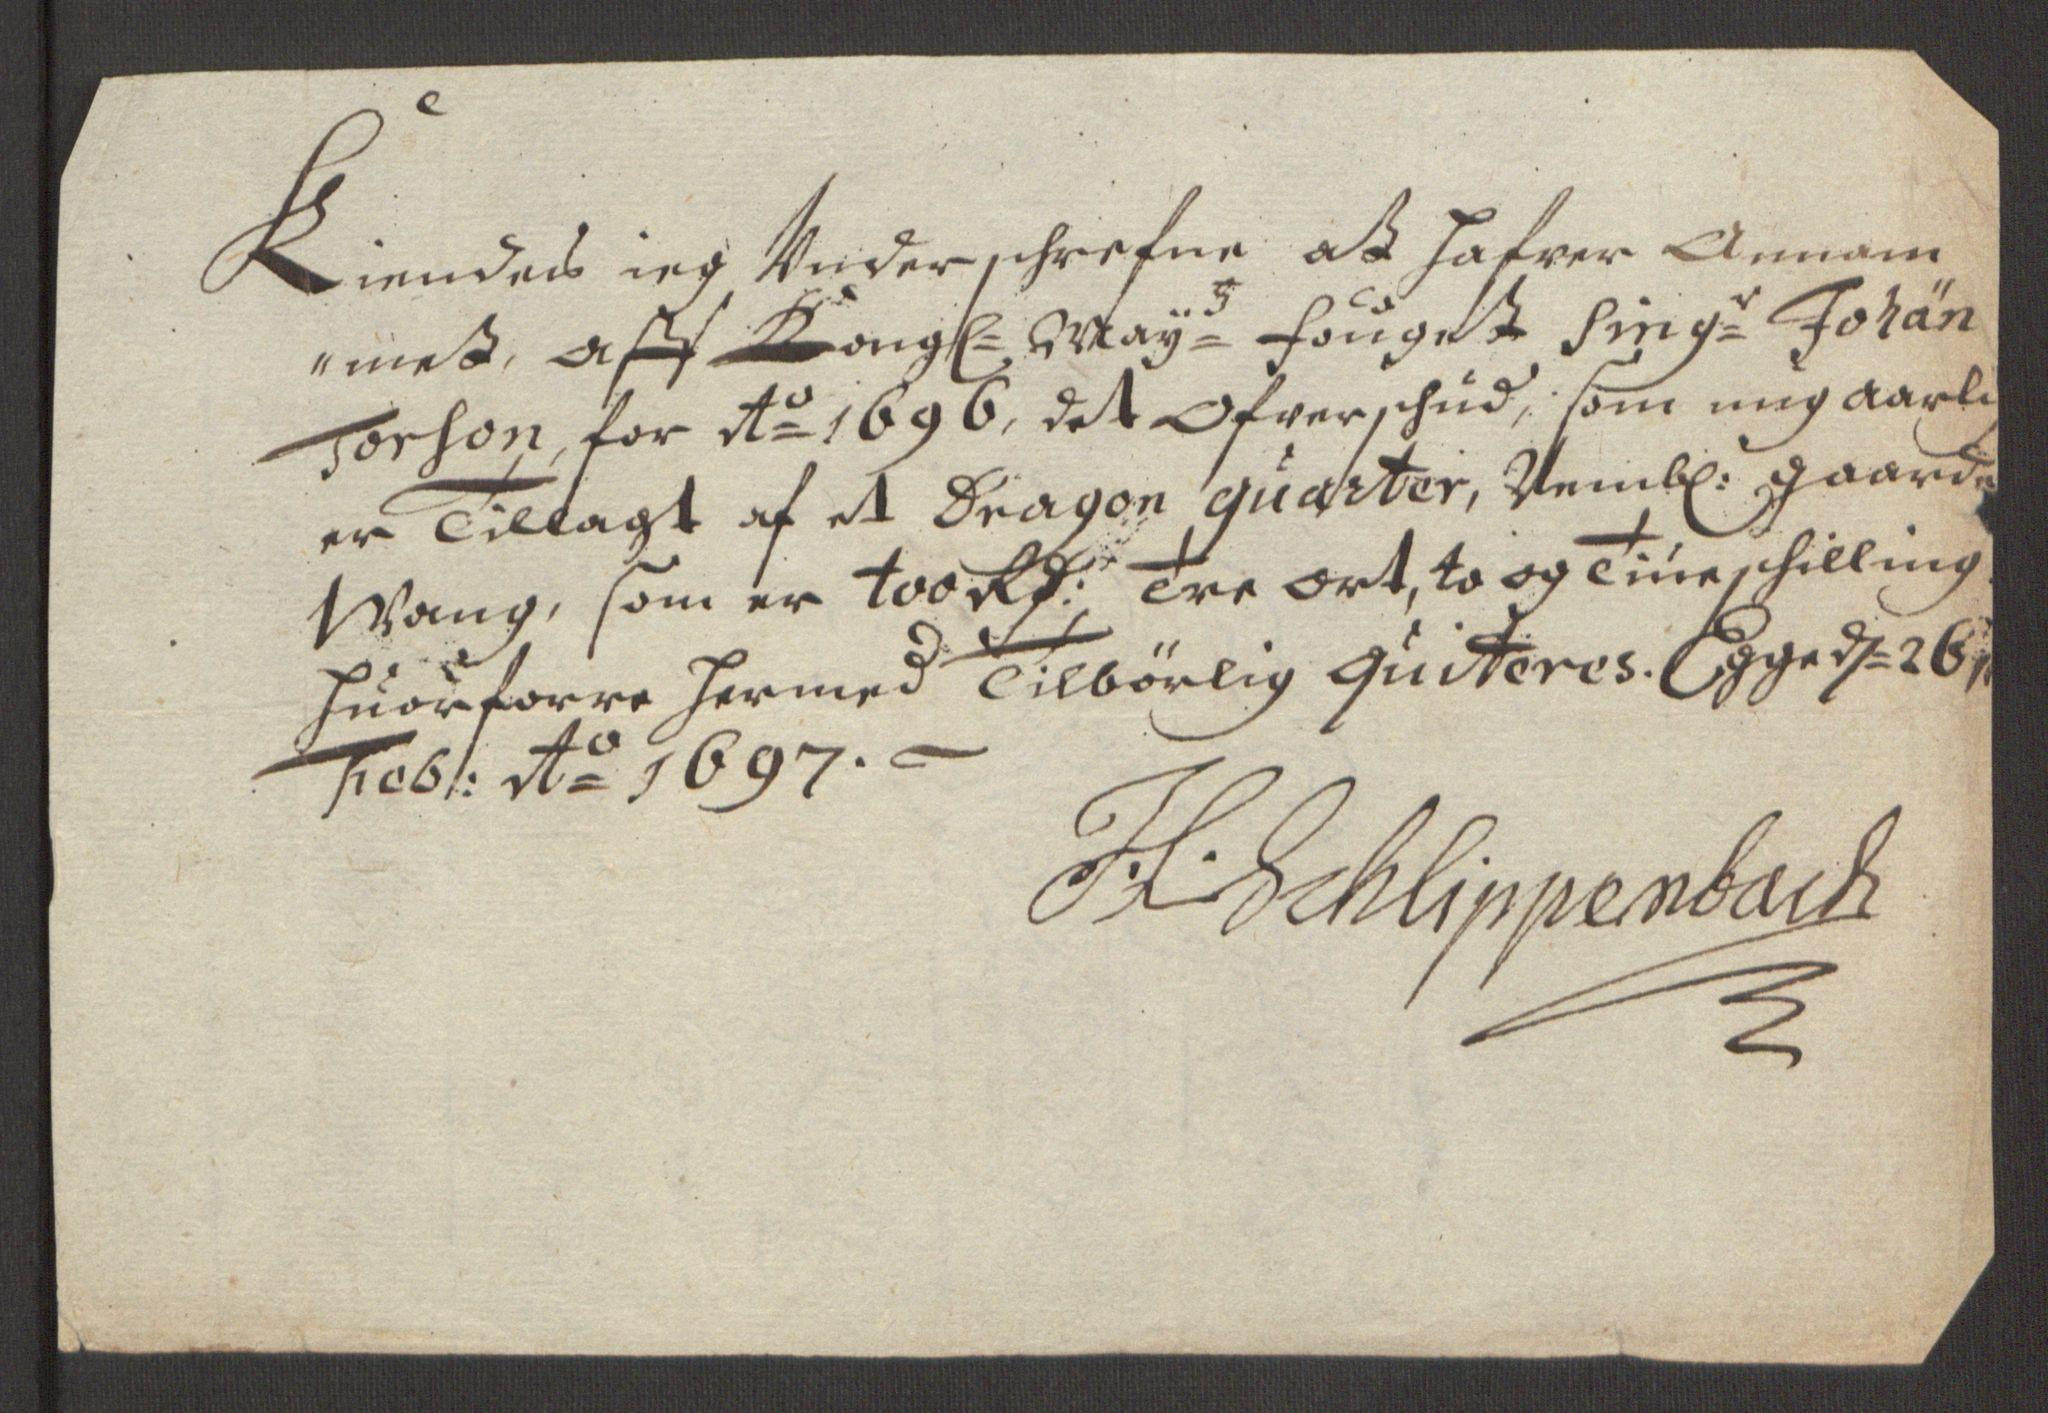 RA, Rentekammeret inntil 1814, Reviderte regnskaper, Fogderegnskap, R63/L4309: Fogderegnskap Inderøy, 1695-1697, s. 348